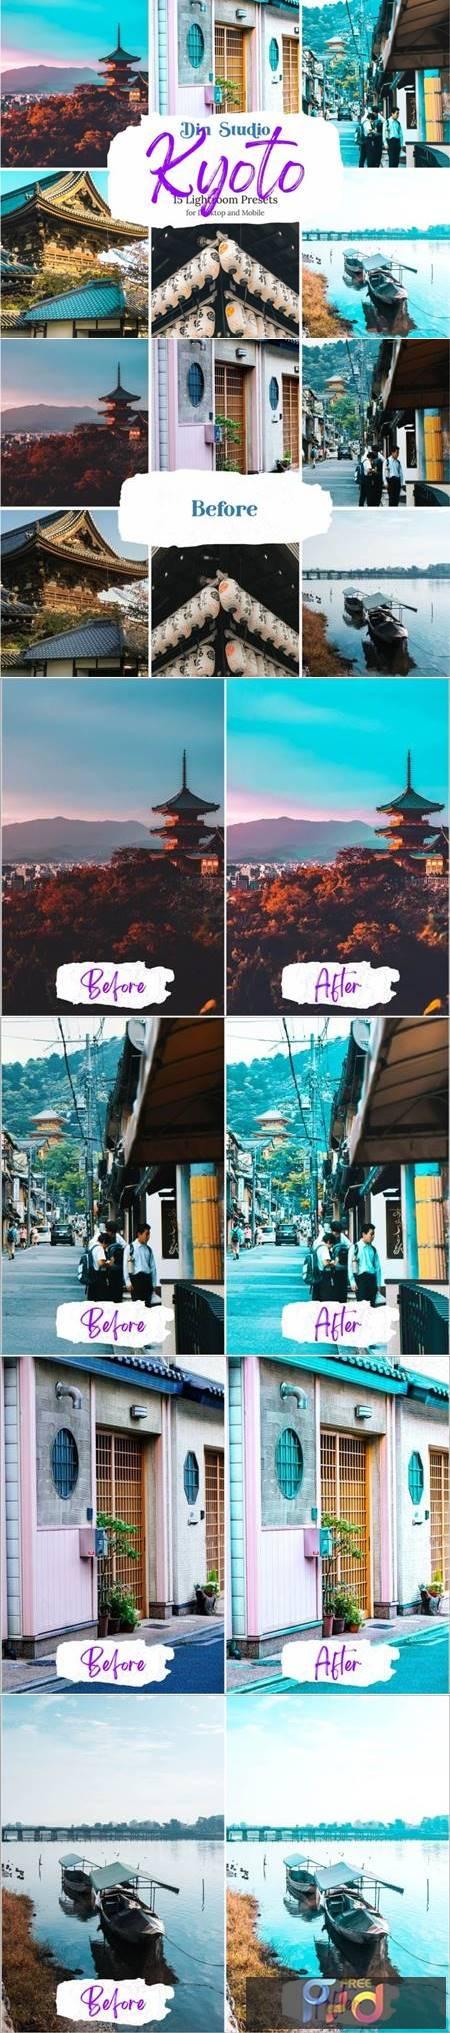 Kyoto Lightroom Presets 5581030 1